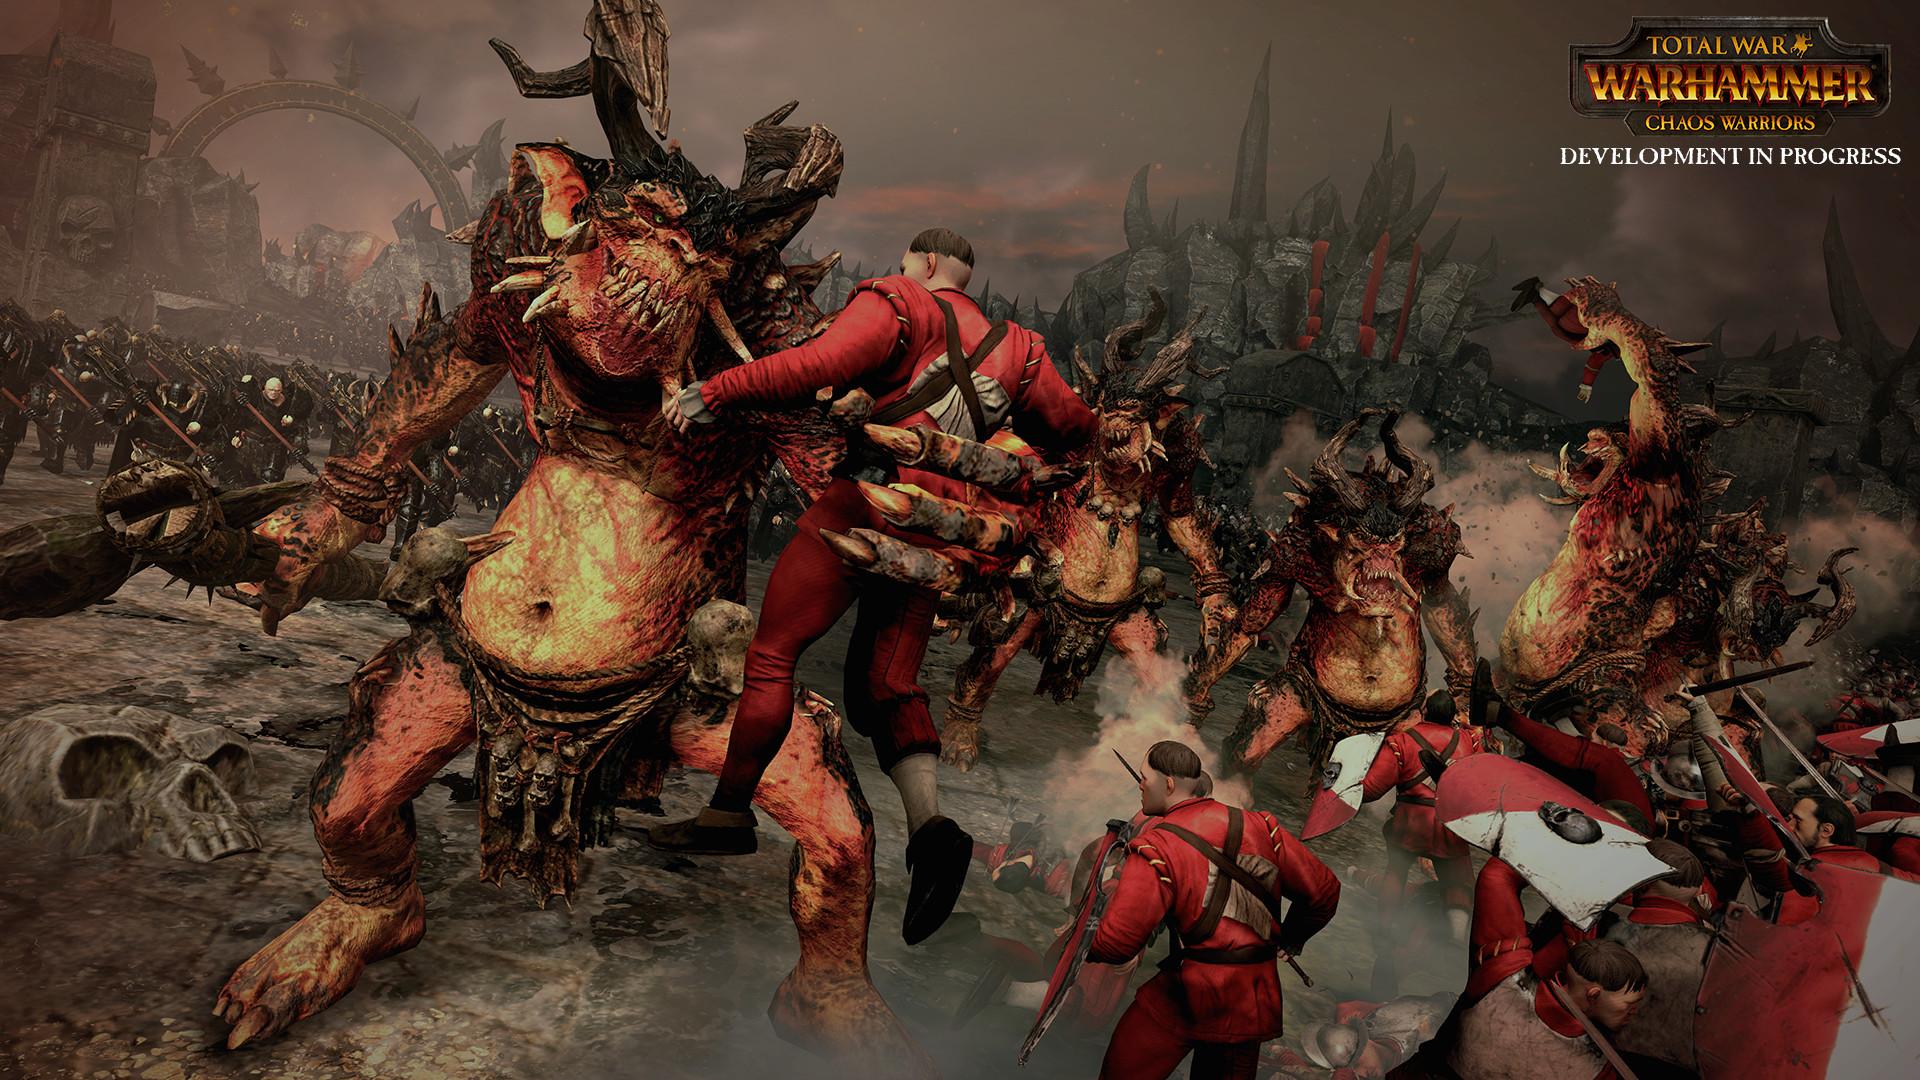 [Jeu vidéo] Total War Warhammer - Page 5 Ss_a6de10663aac8b256e57b737efdc6195cfa0eab6.1920x1080